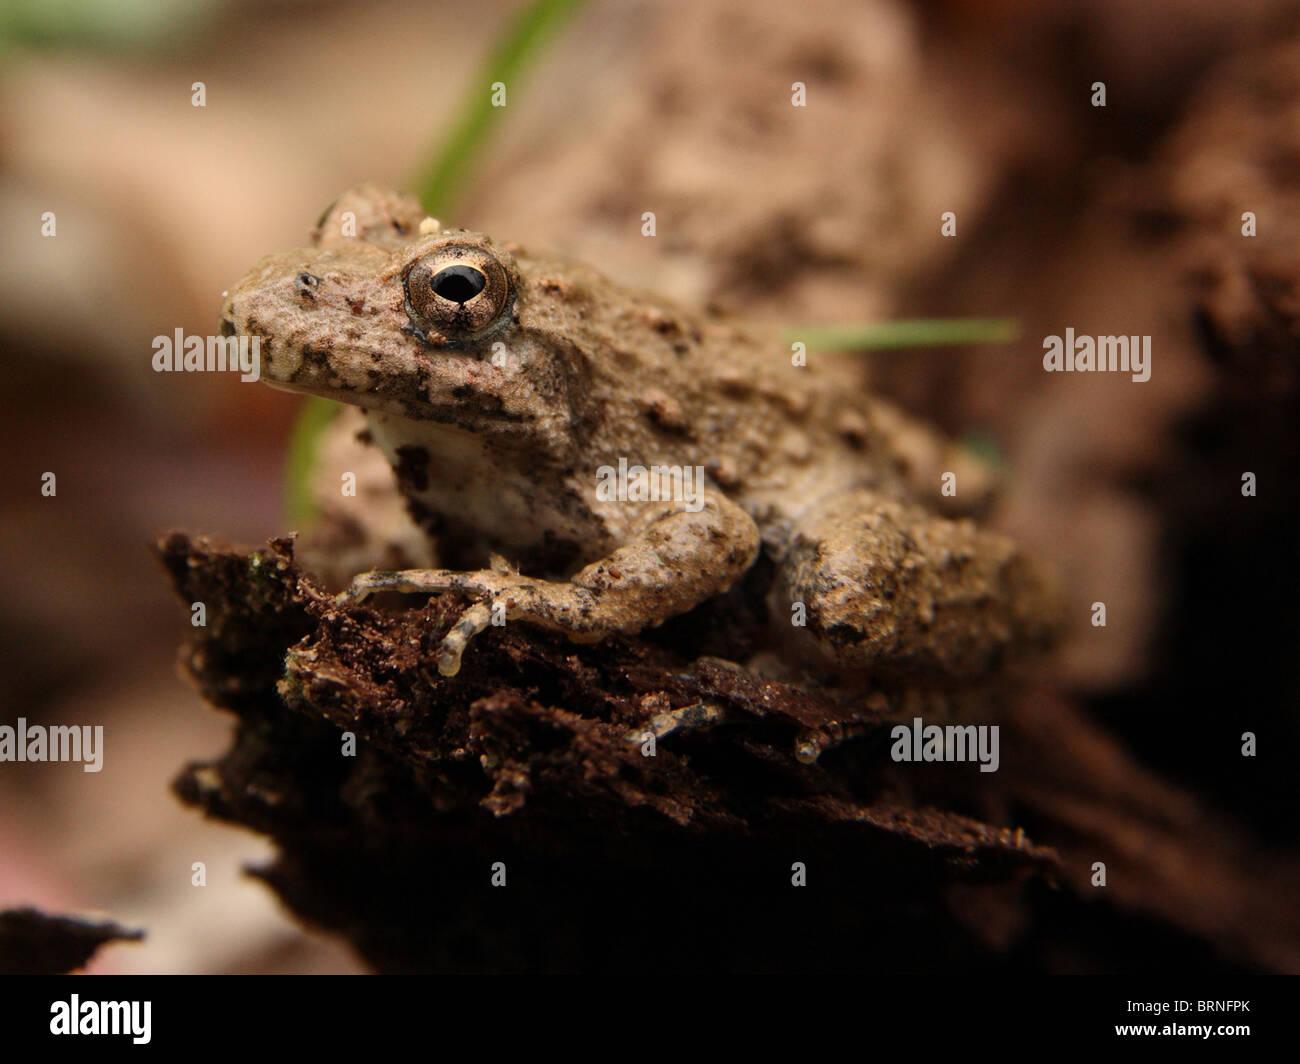 Blanchard's Cricket sapo (Acris crepitans blanchardi) Foto de stock